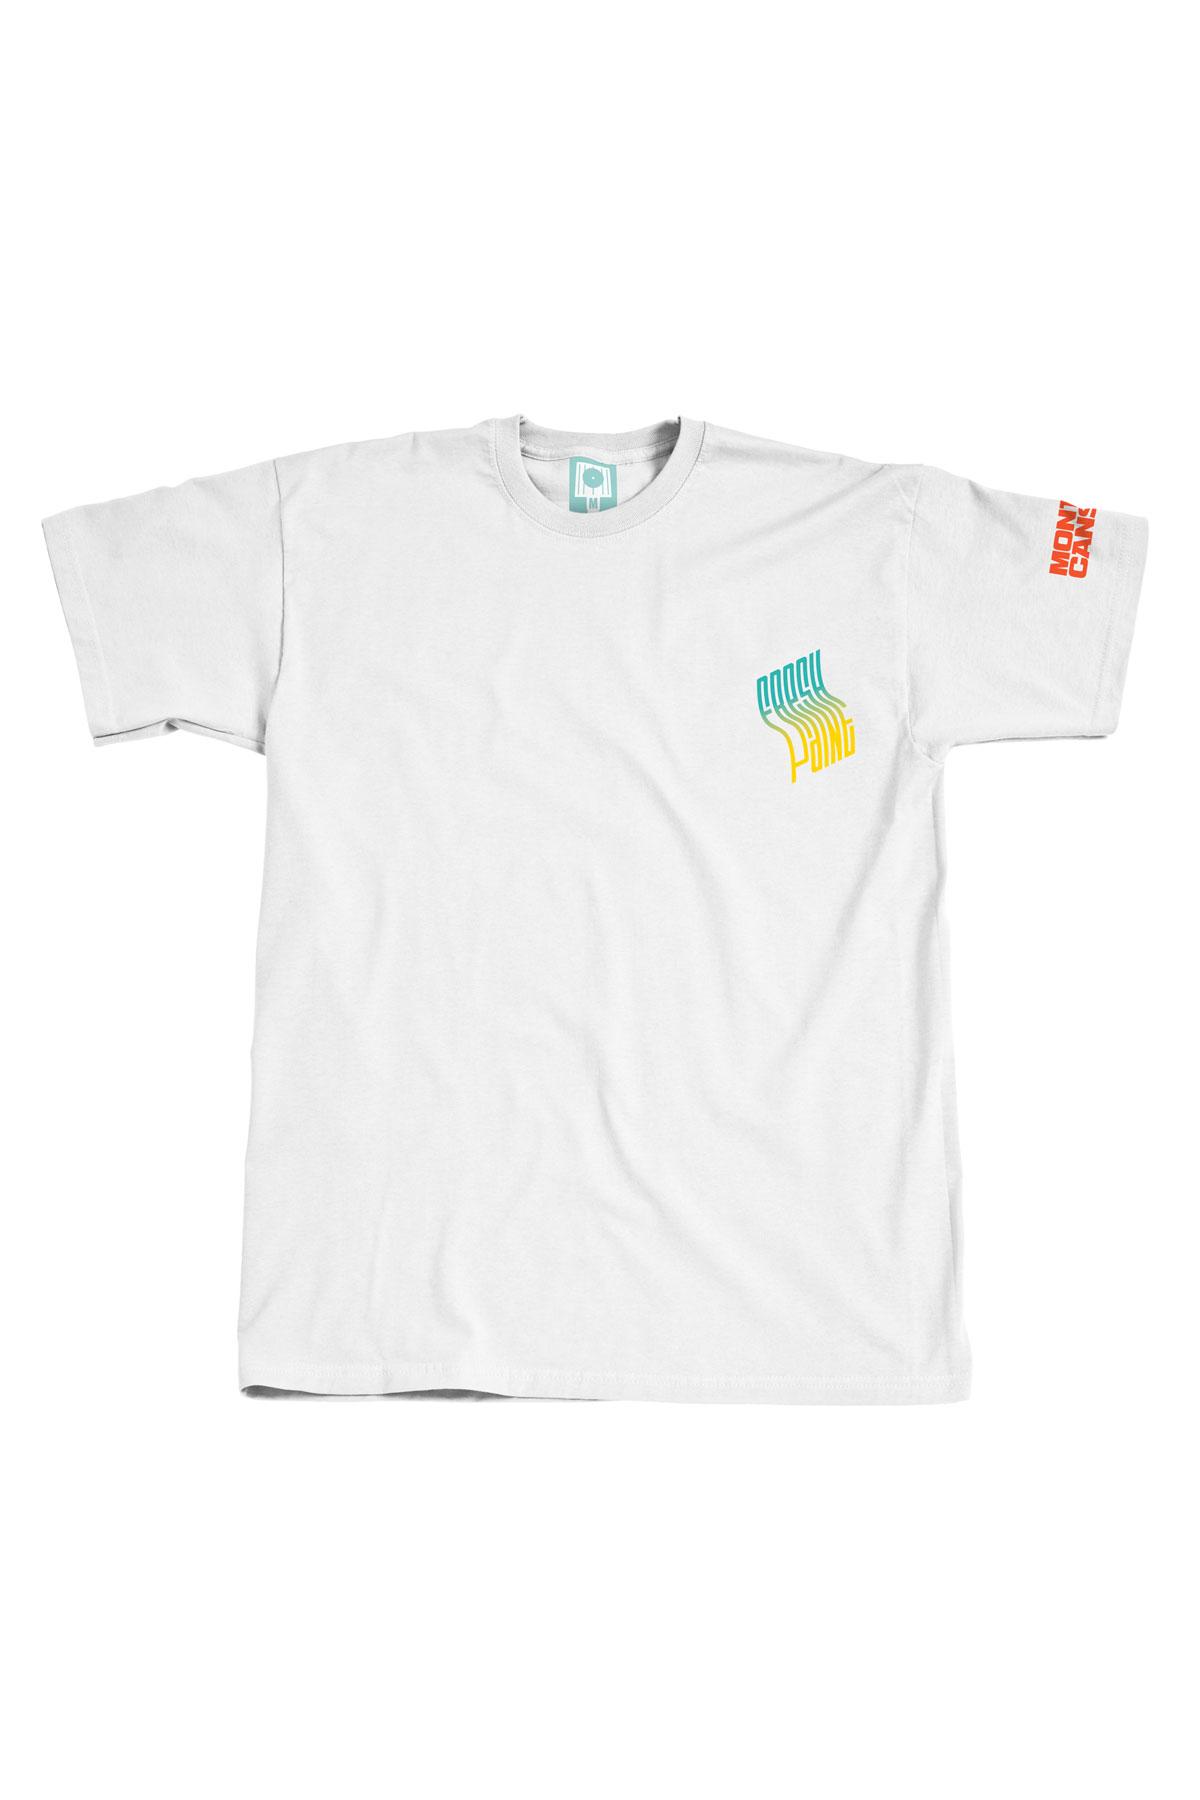 Montana FRESH PAINT FADE White T-Shirt by Prefid